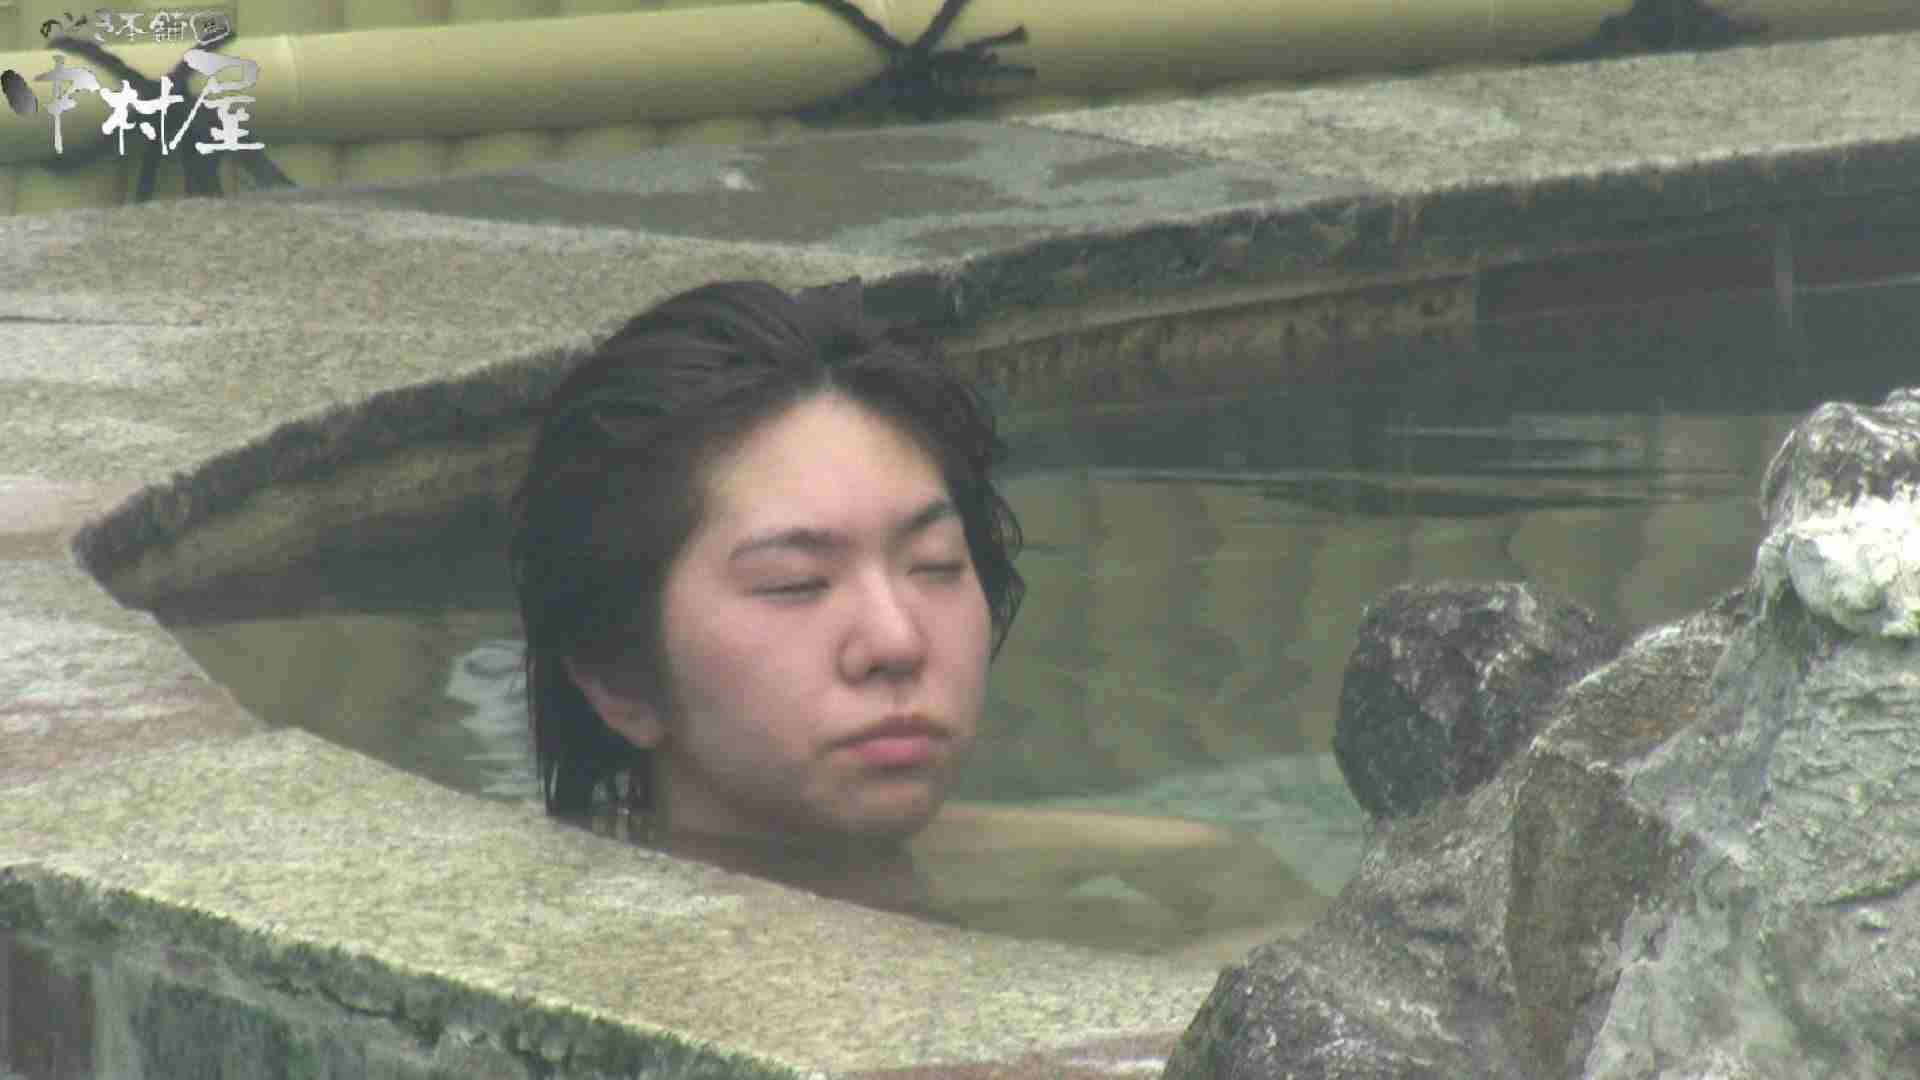 Aquaな露天風呂Vol.907 盗撮師作品  70pic 39